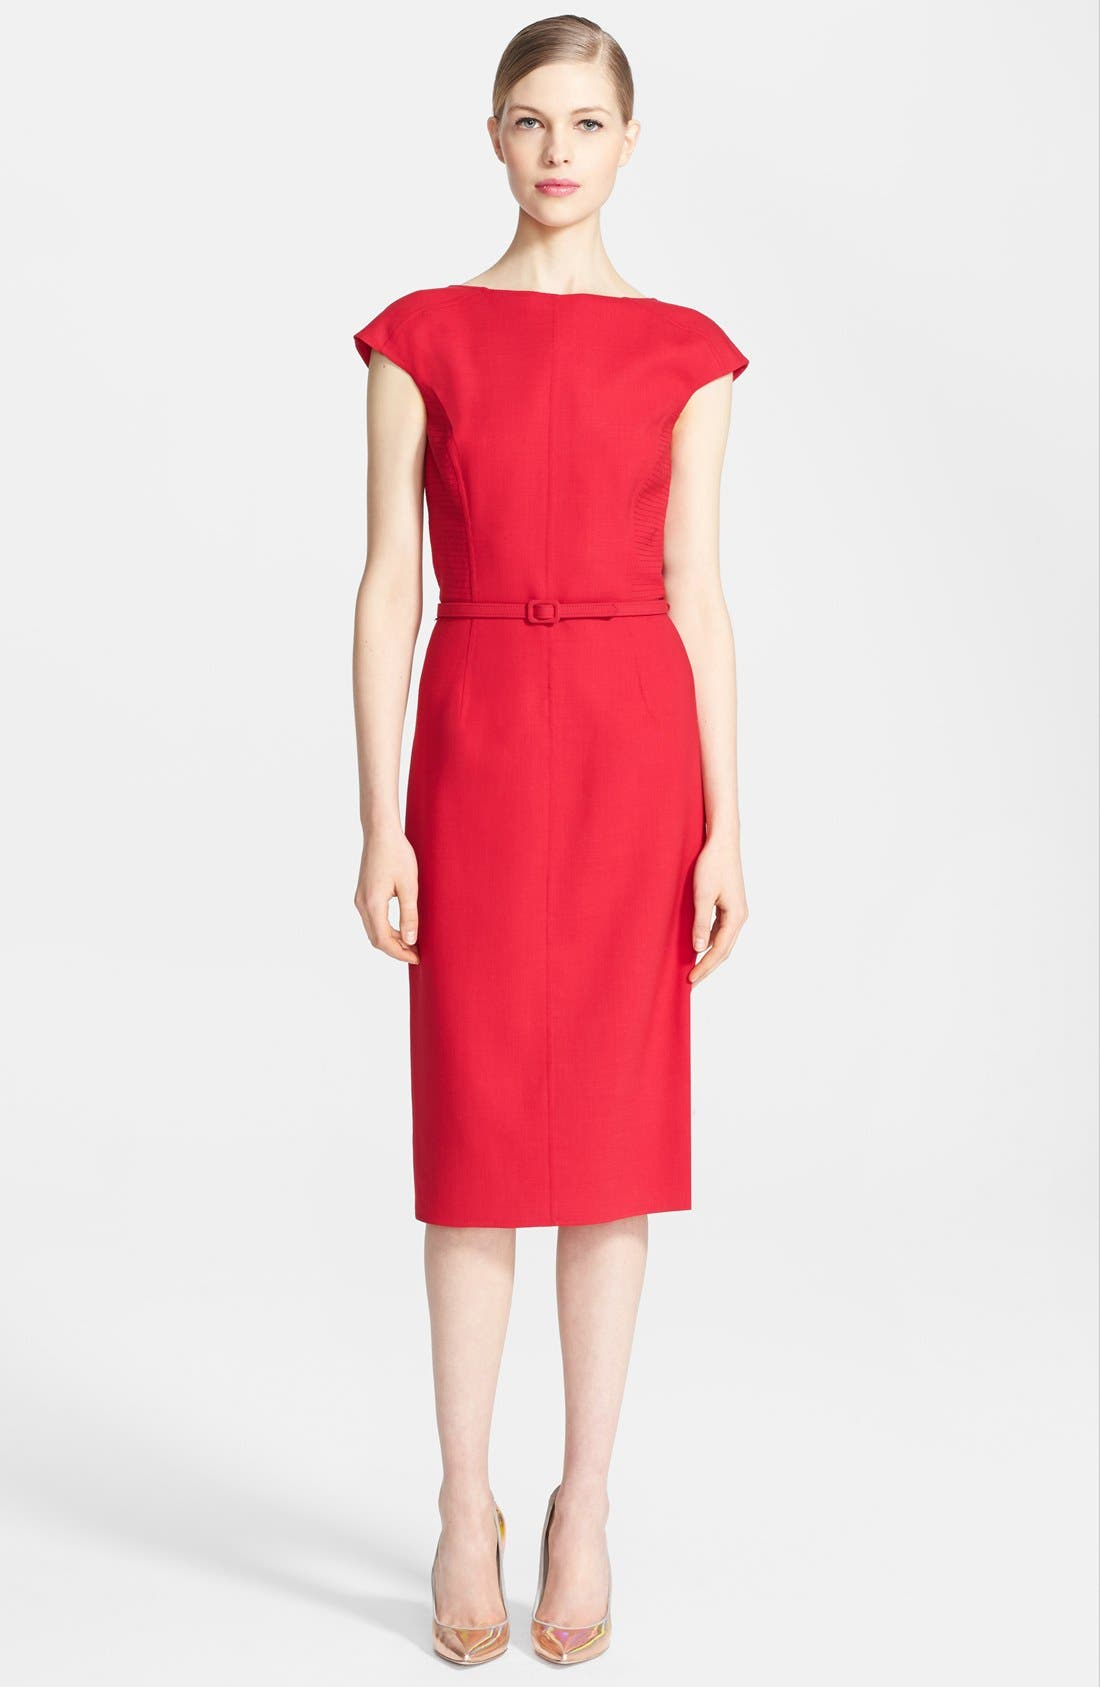 Alternate Image 1 Selected - Oscar de la Renta Ruffle Back Pencil Dress